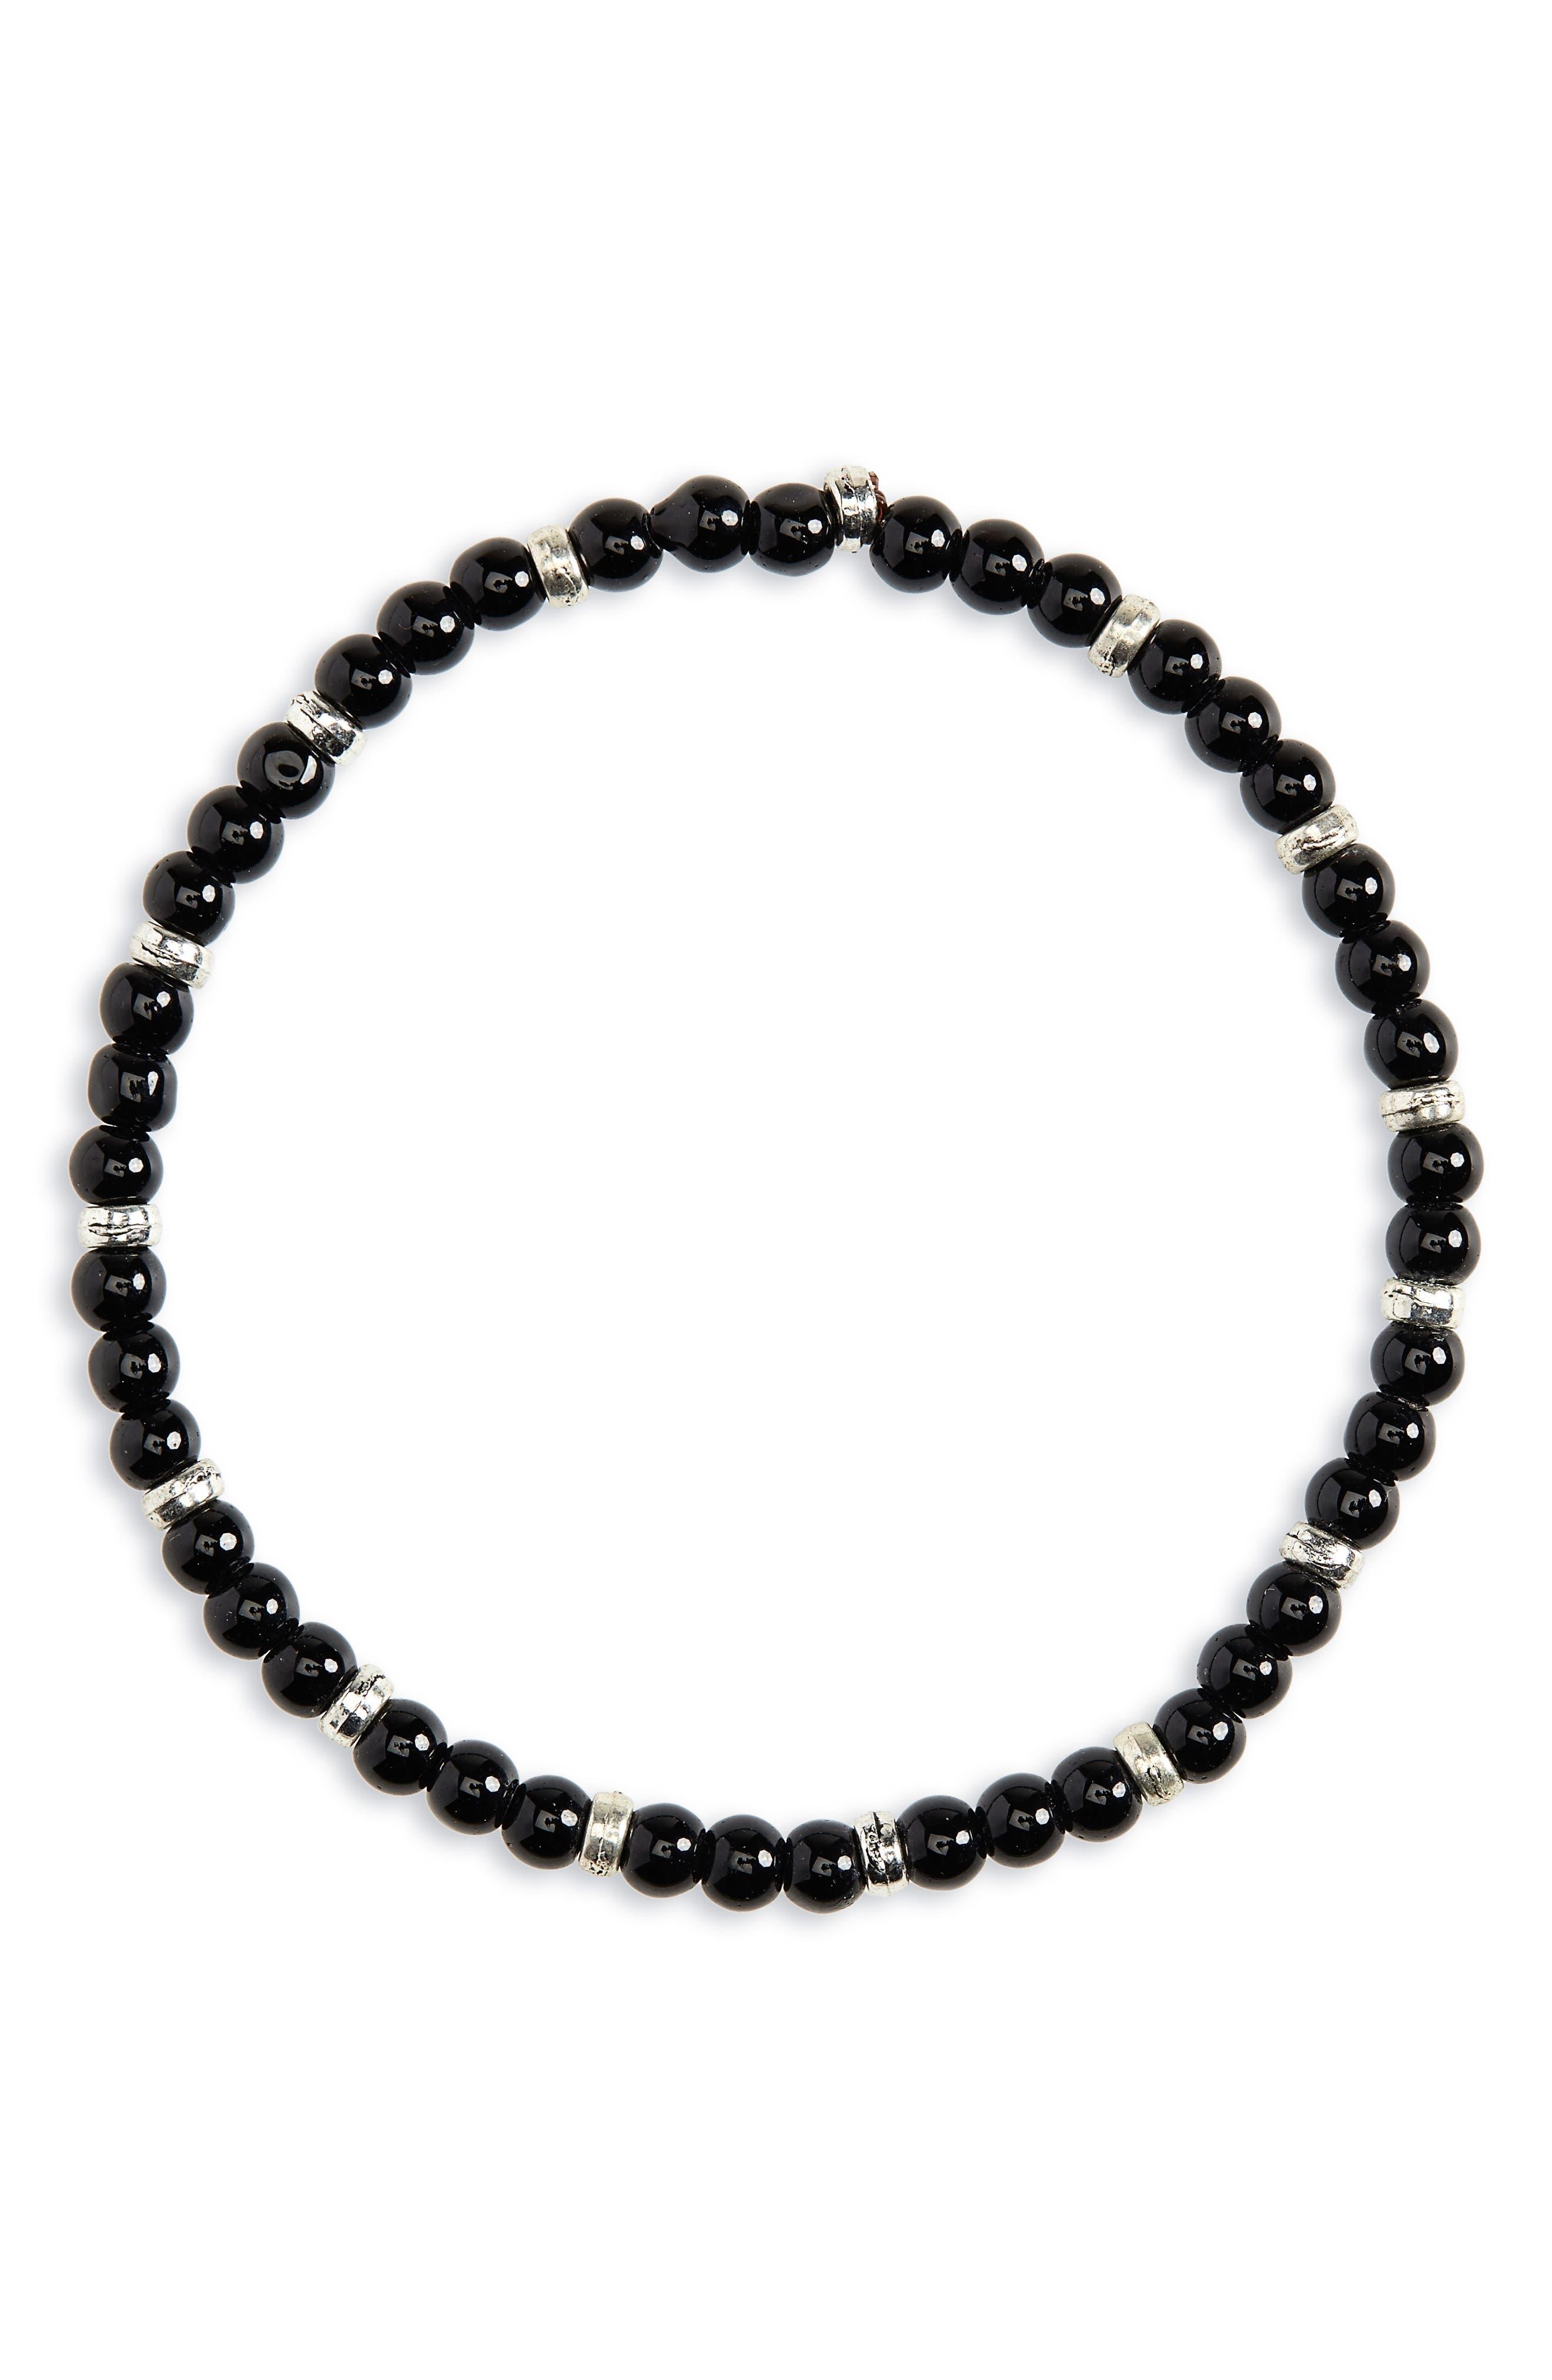 NORDSTROM MEN'S SHOP, Beaded Bracelet, Main thumbnail 1, color, BLACK SILVER